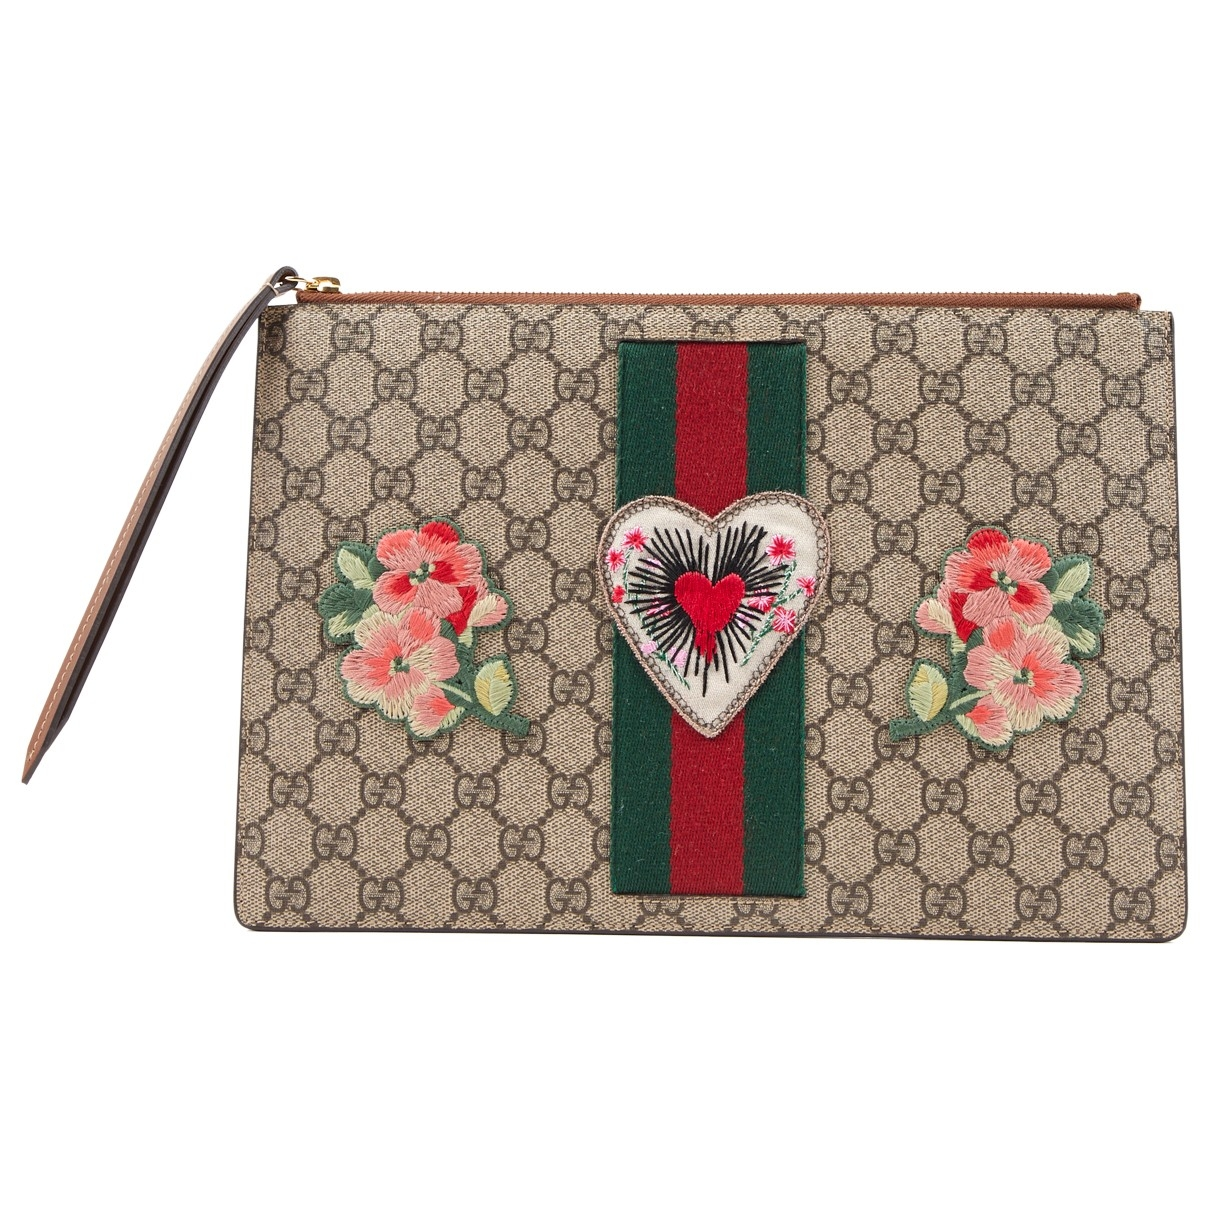 Gucci \N Brown Leather Clutch bag for Women \N